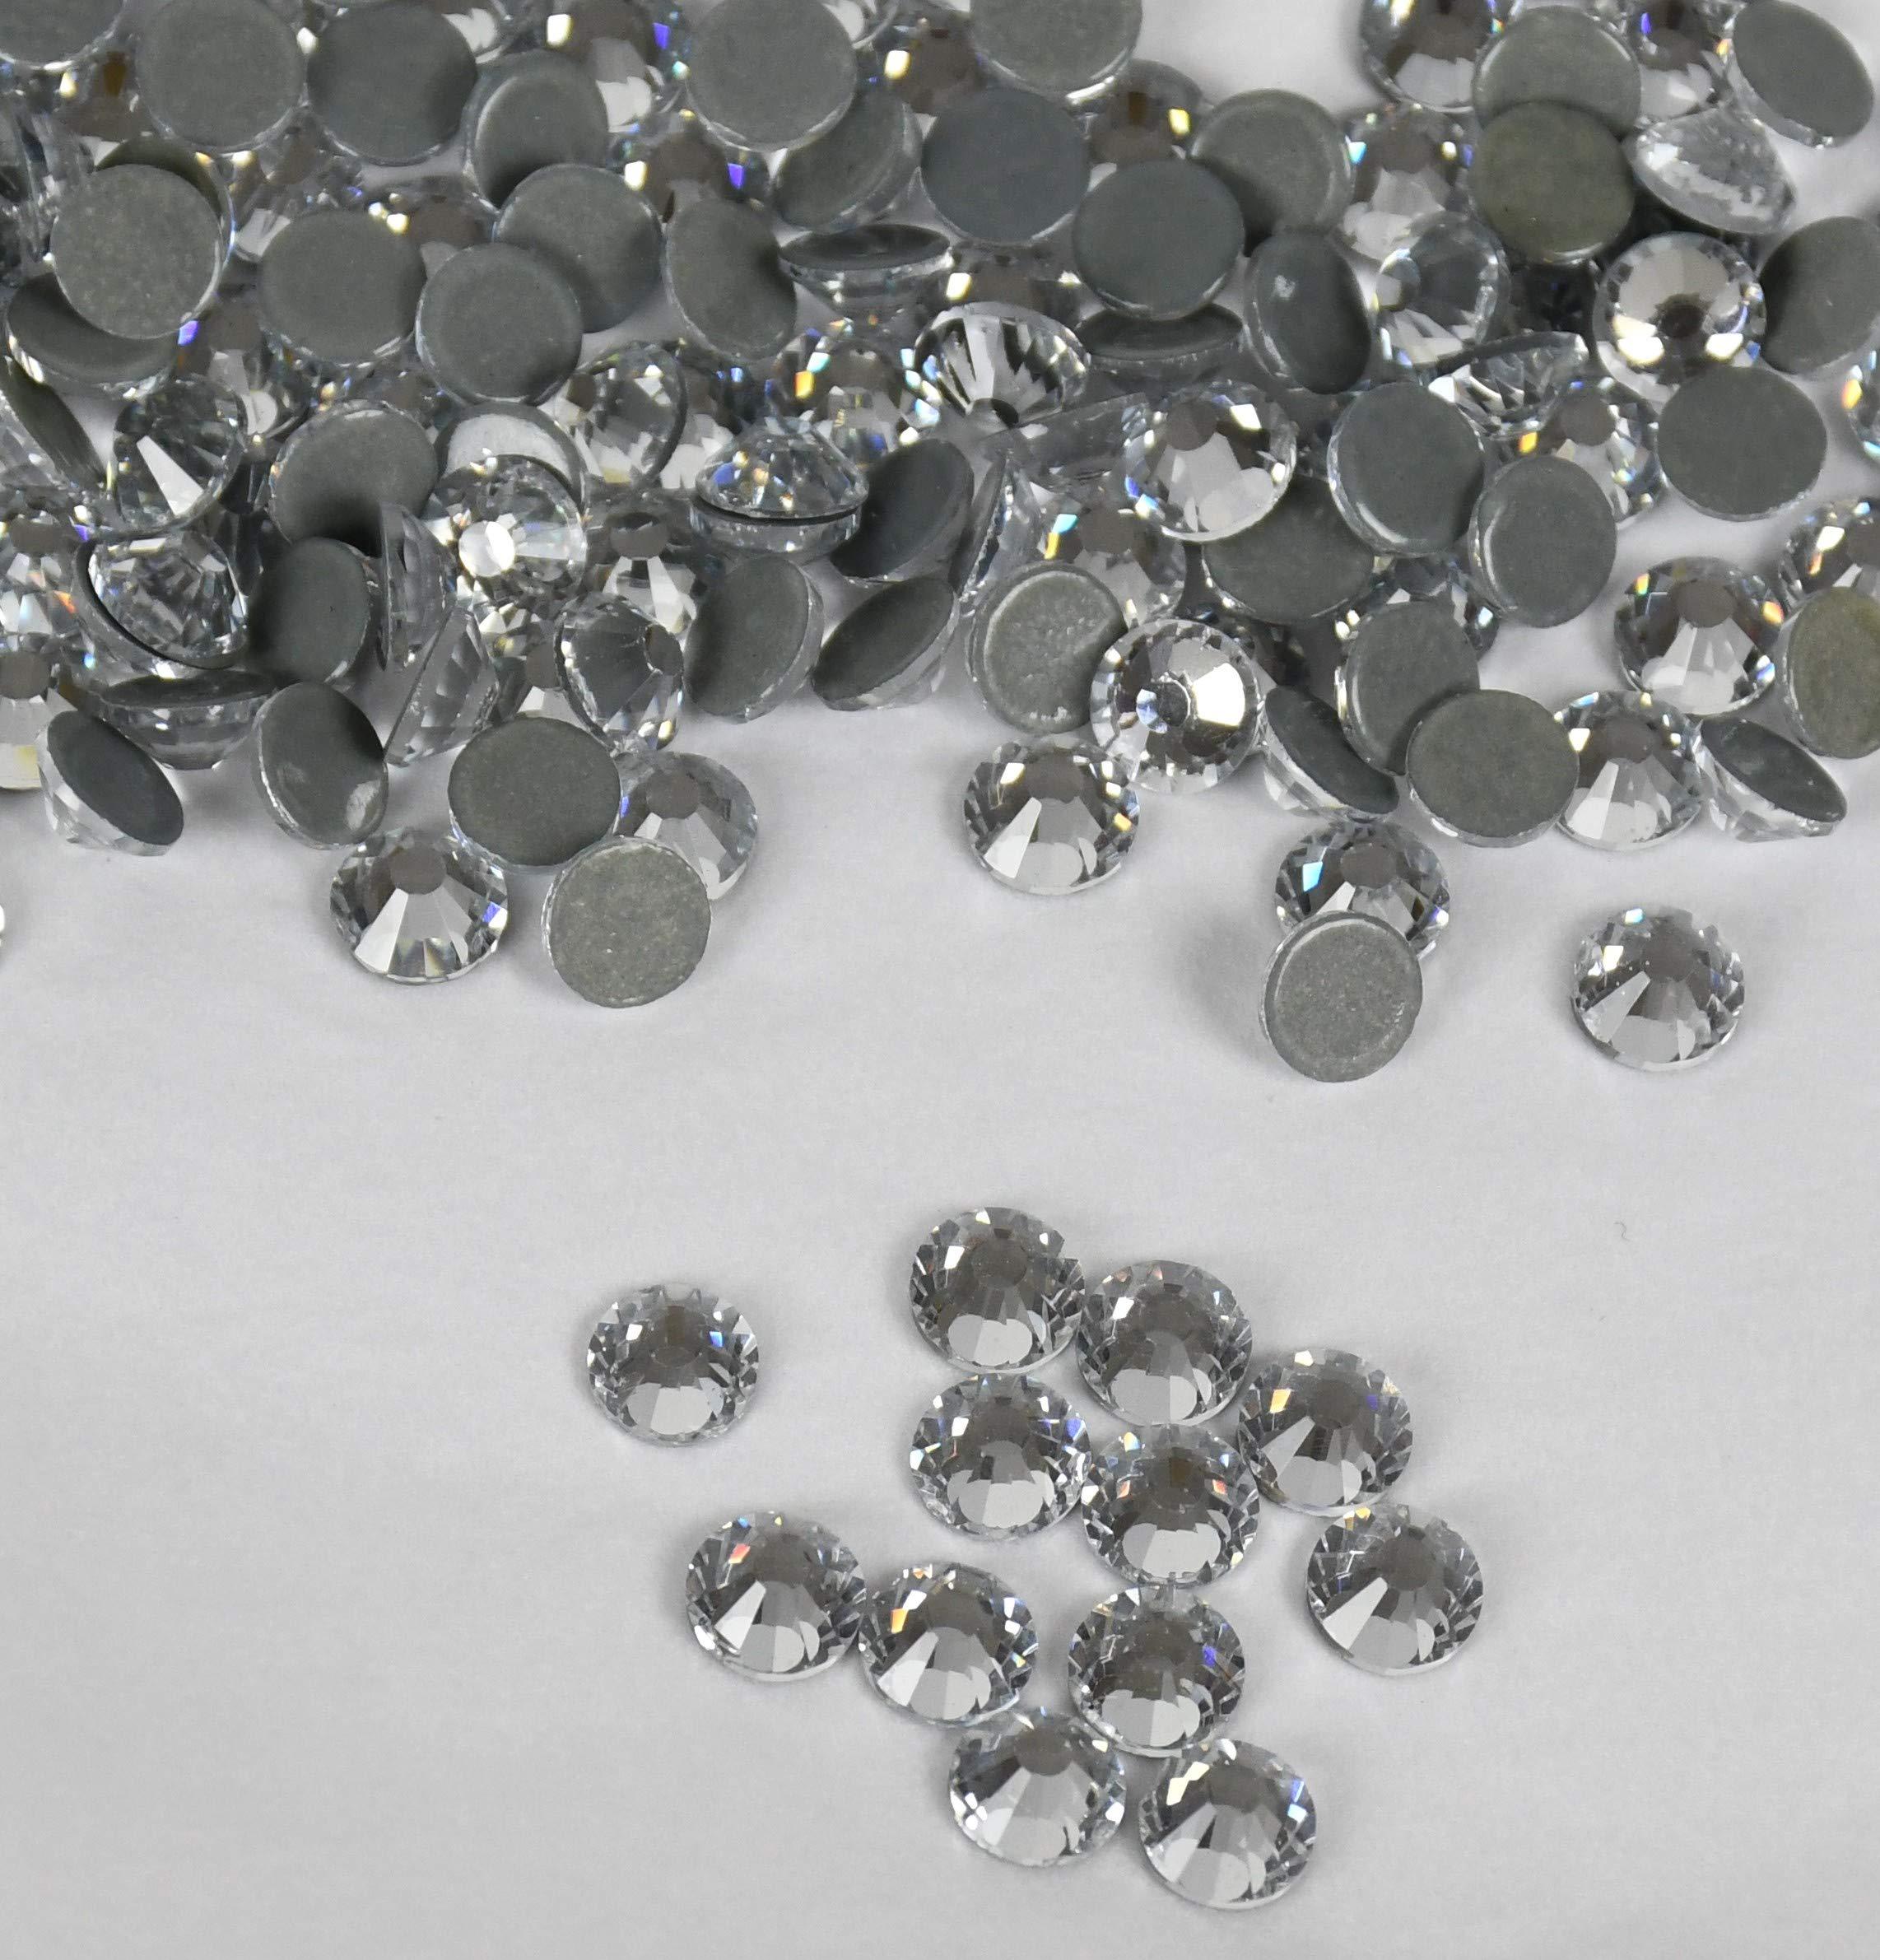 NEW ThreadNanny CZECH Quality 10gross (1440pcs) HotFix Rhinestones Crystals - 5mm/20ss, Crystal/Clear Color by ThreadNanny